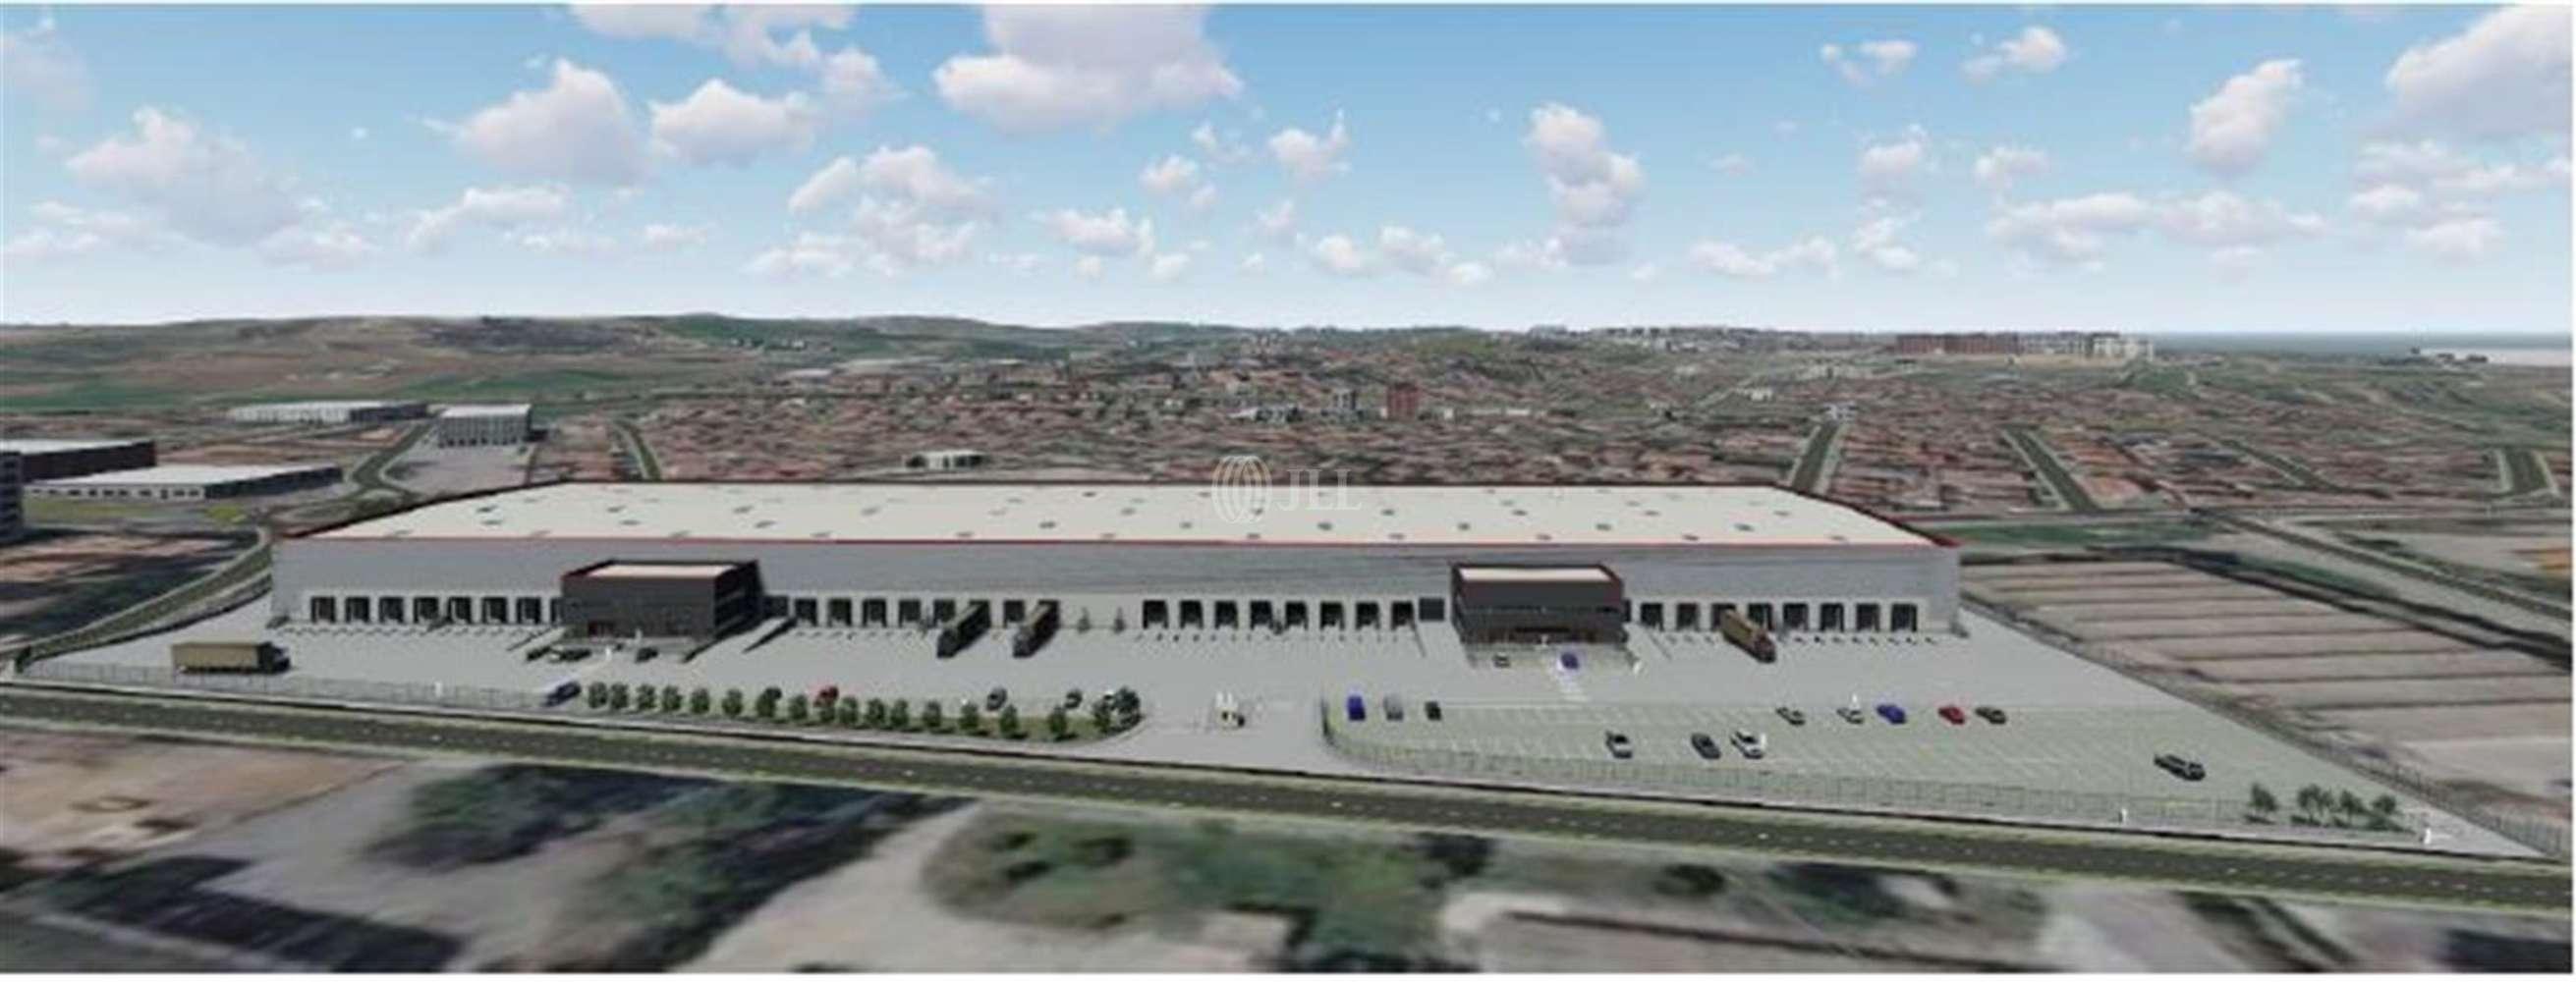 Naves industriales y logísticas Santa perpètua de mogoda, 08130 - Nave Logistica - B0488 PI LA LLAGOSTA